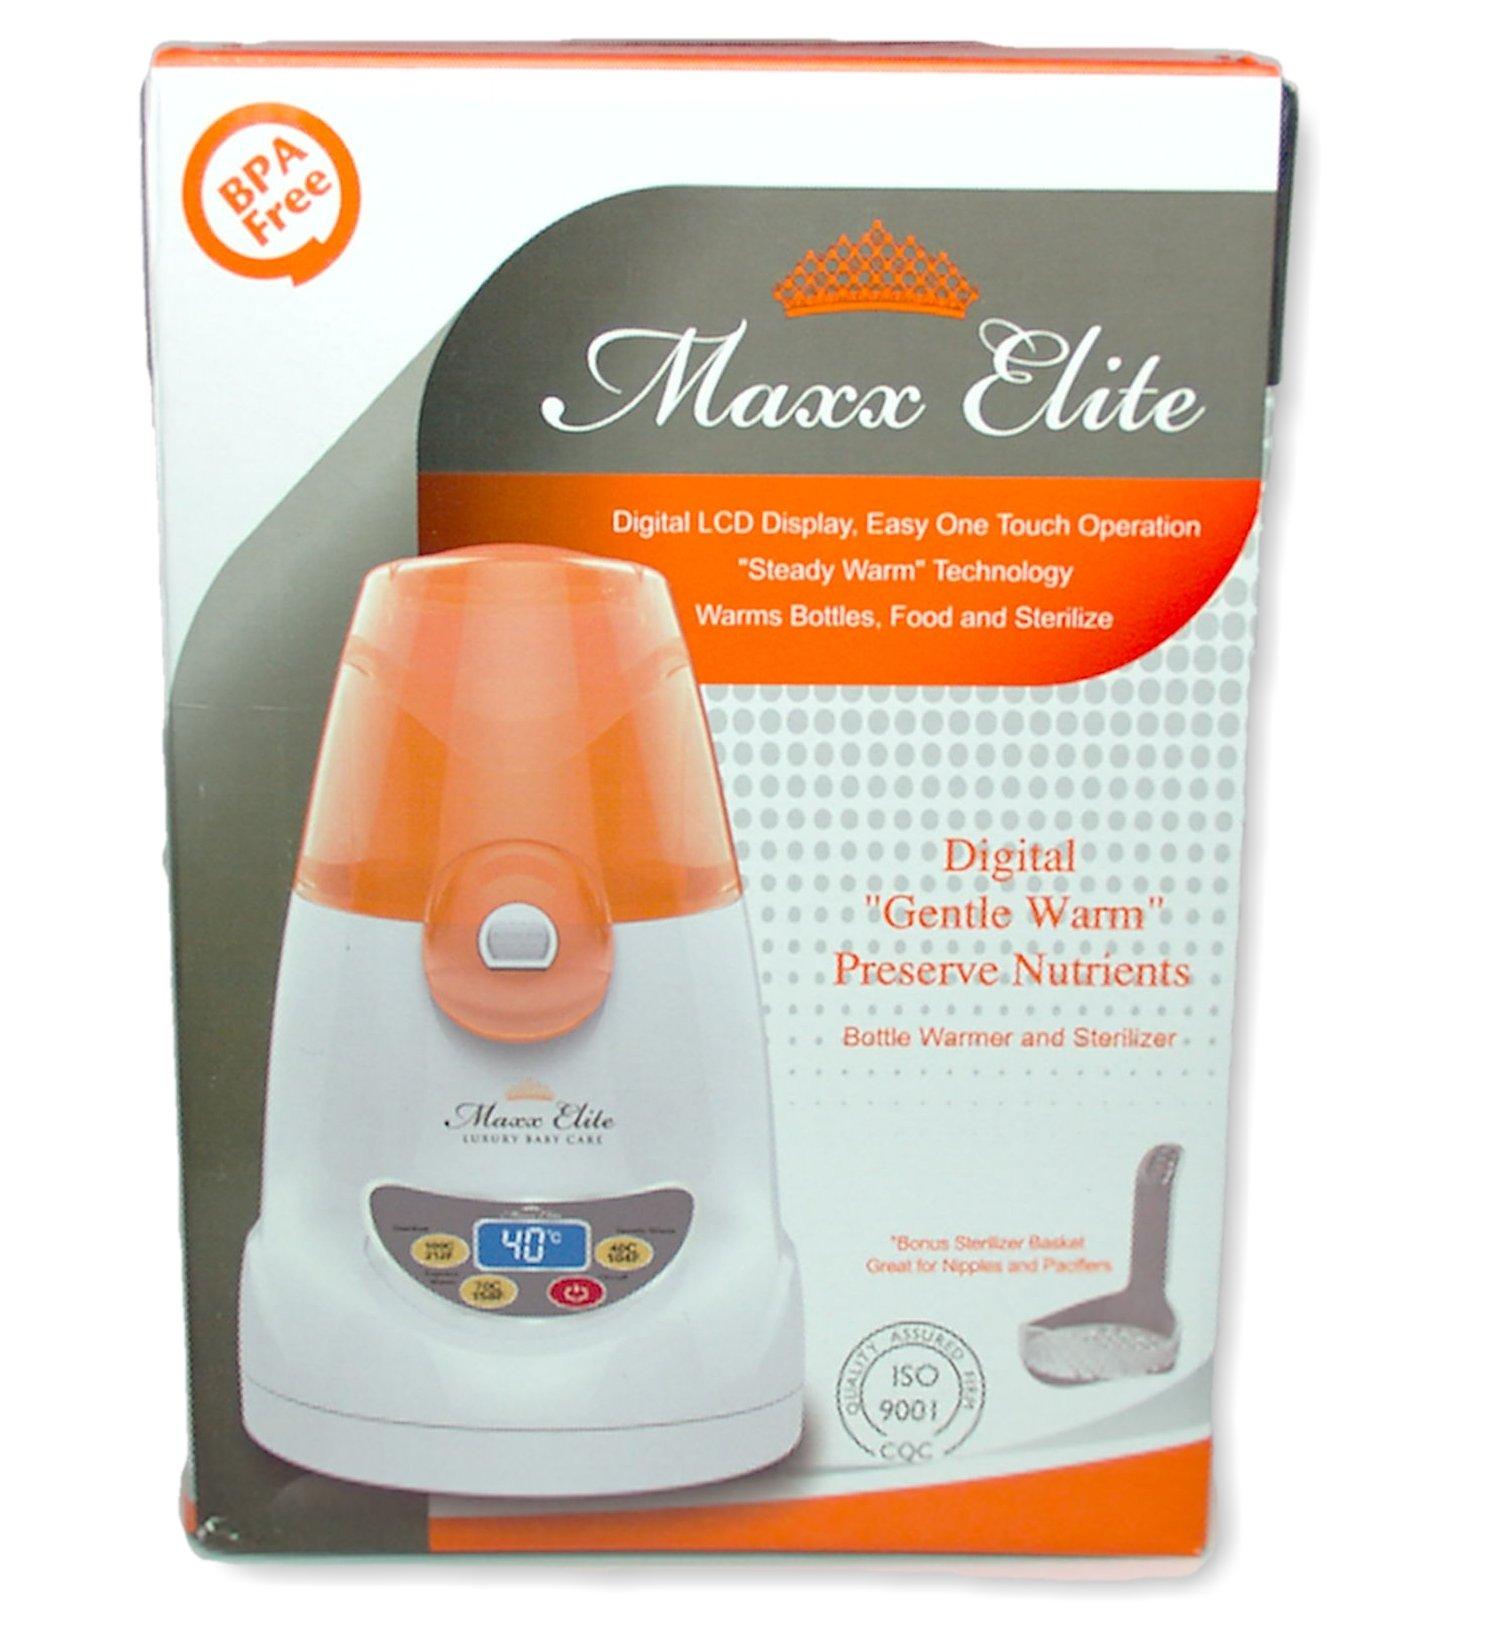 Maxx Elite ''Digital Gentle Warm'' Bottle Warmer & Sterilizer w/''Steady Warm'' and LCD Display (Orange) by Maxx Elite (Image #10)